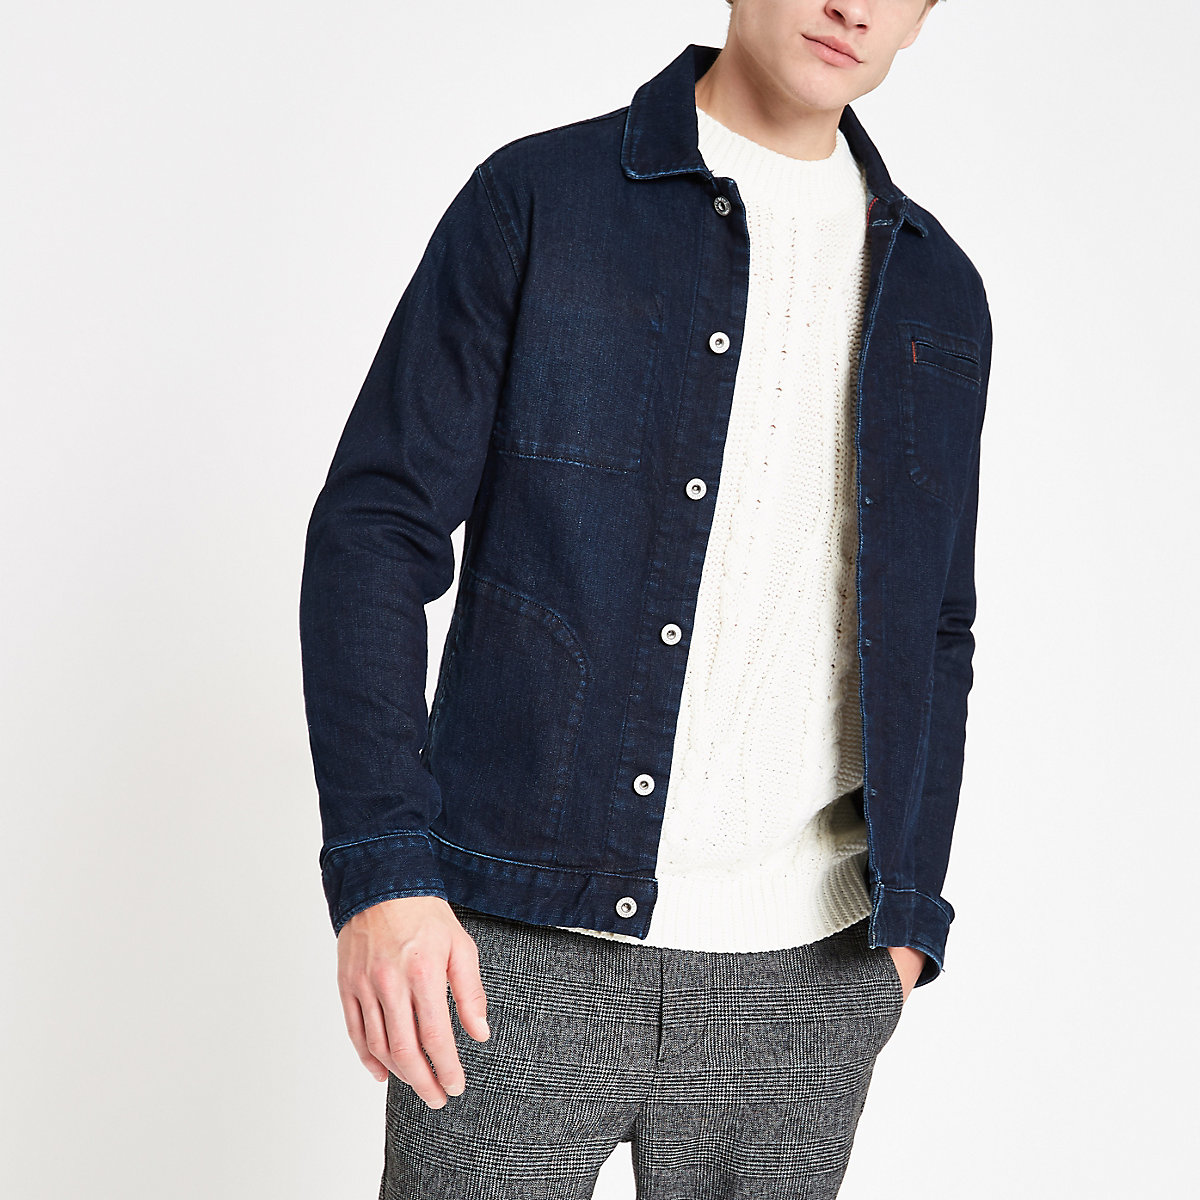 Pepe Jeans dark blue denim jacket